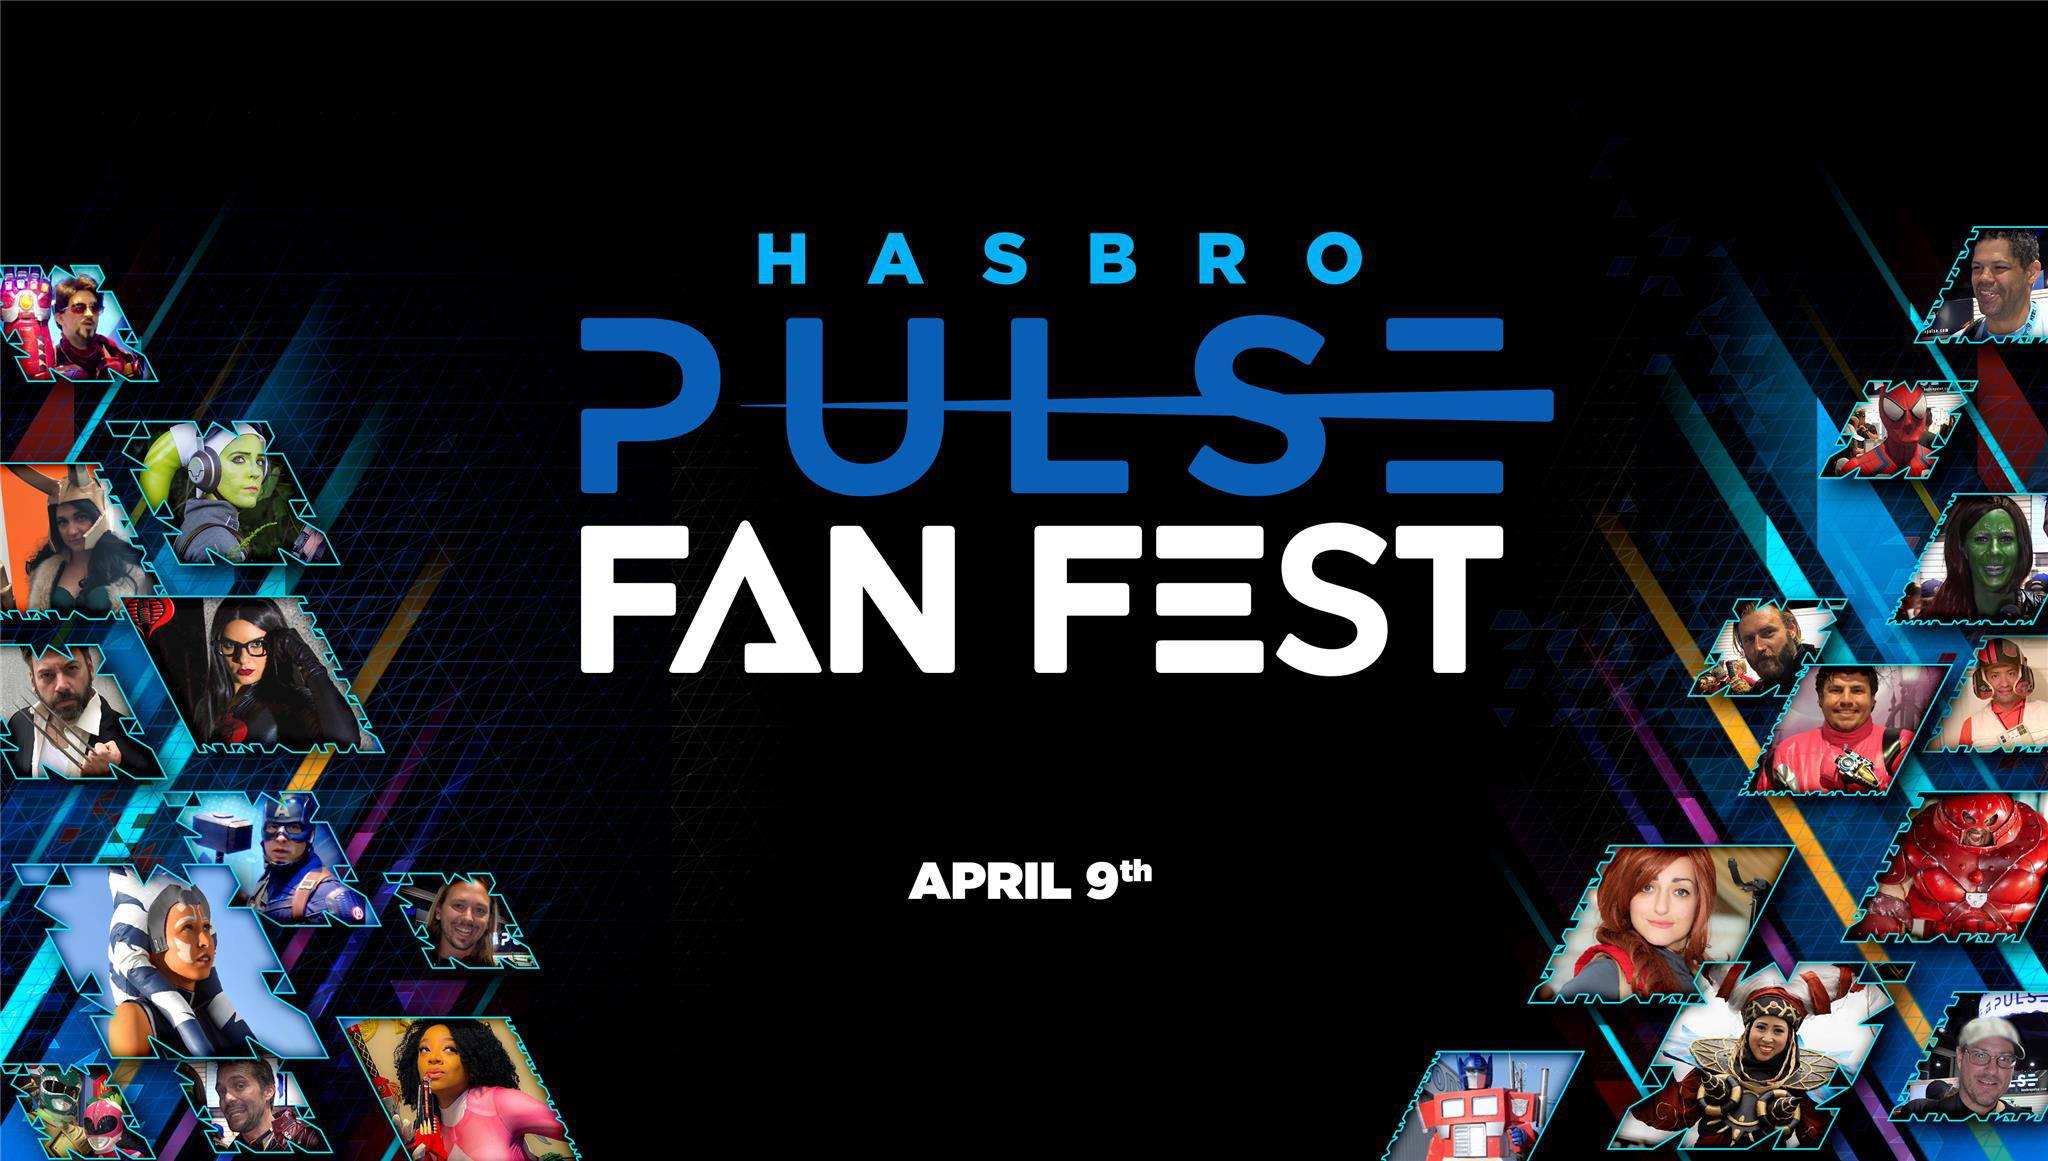 Watch the Hasbro Pulse Fan Fest Livestream on April 9 here